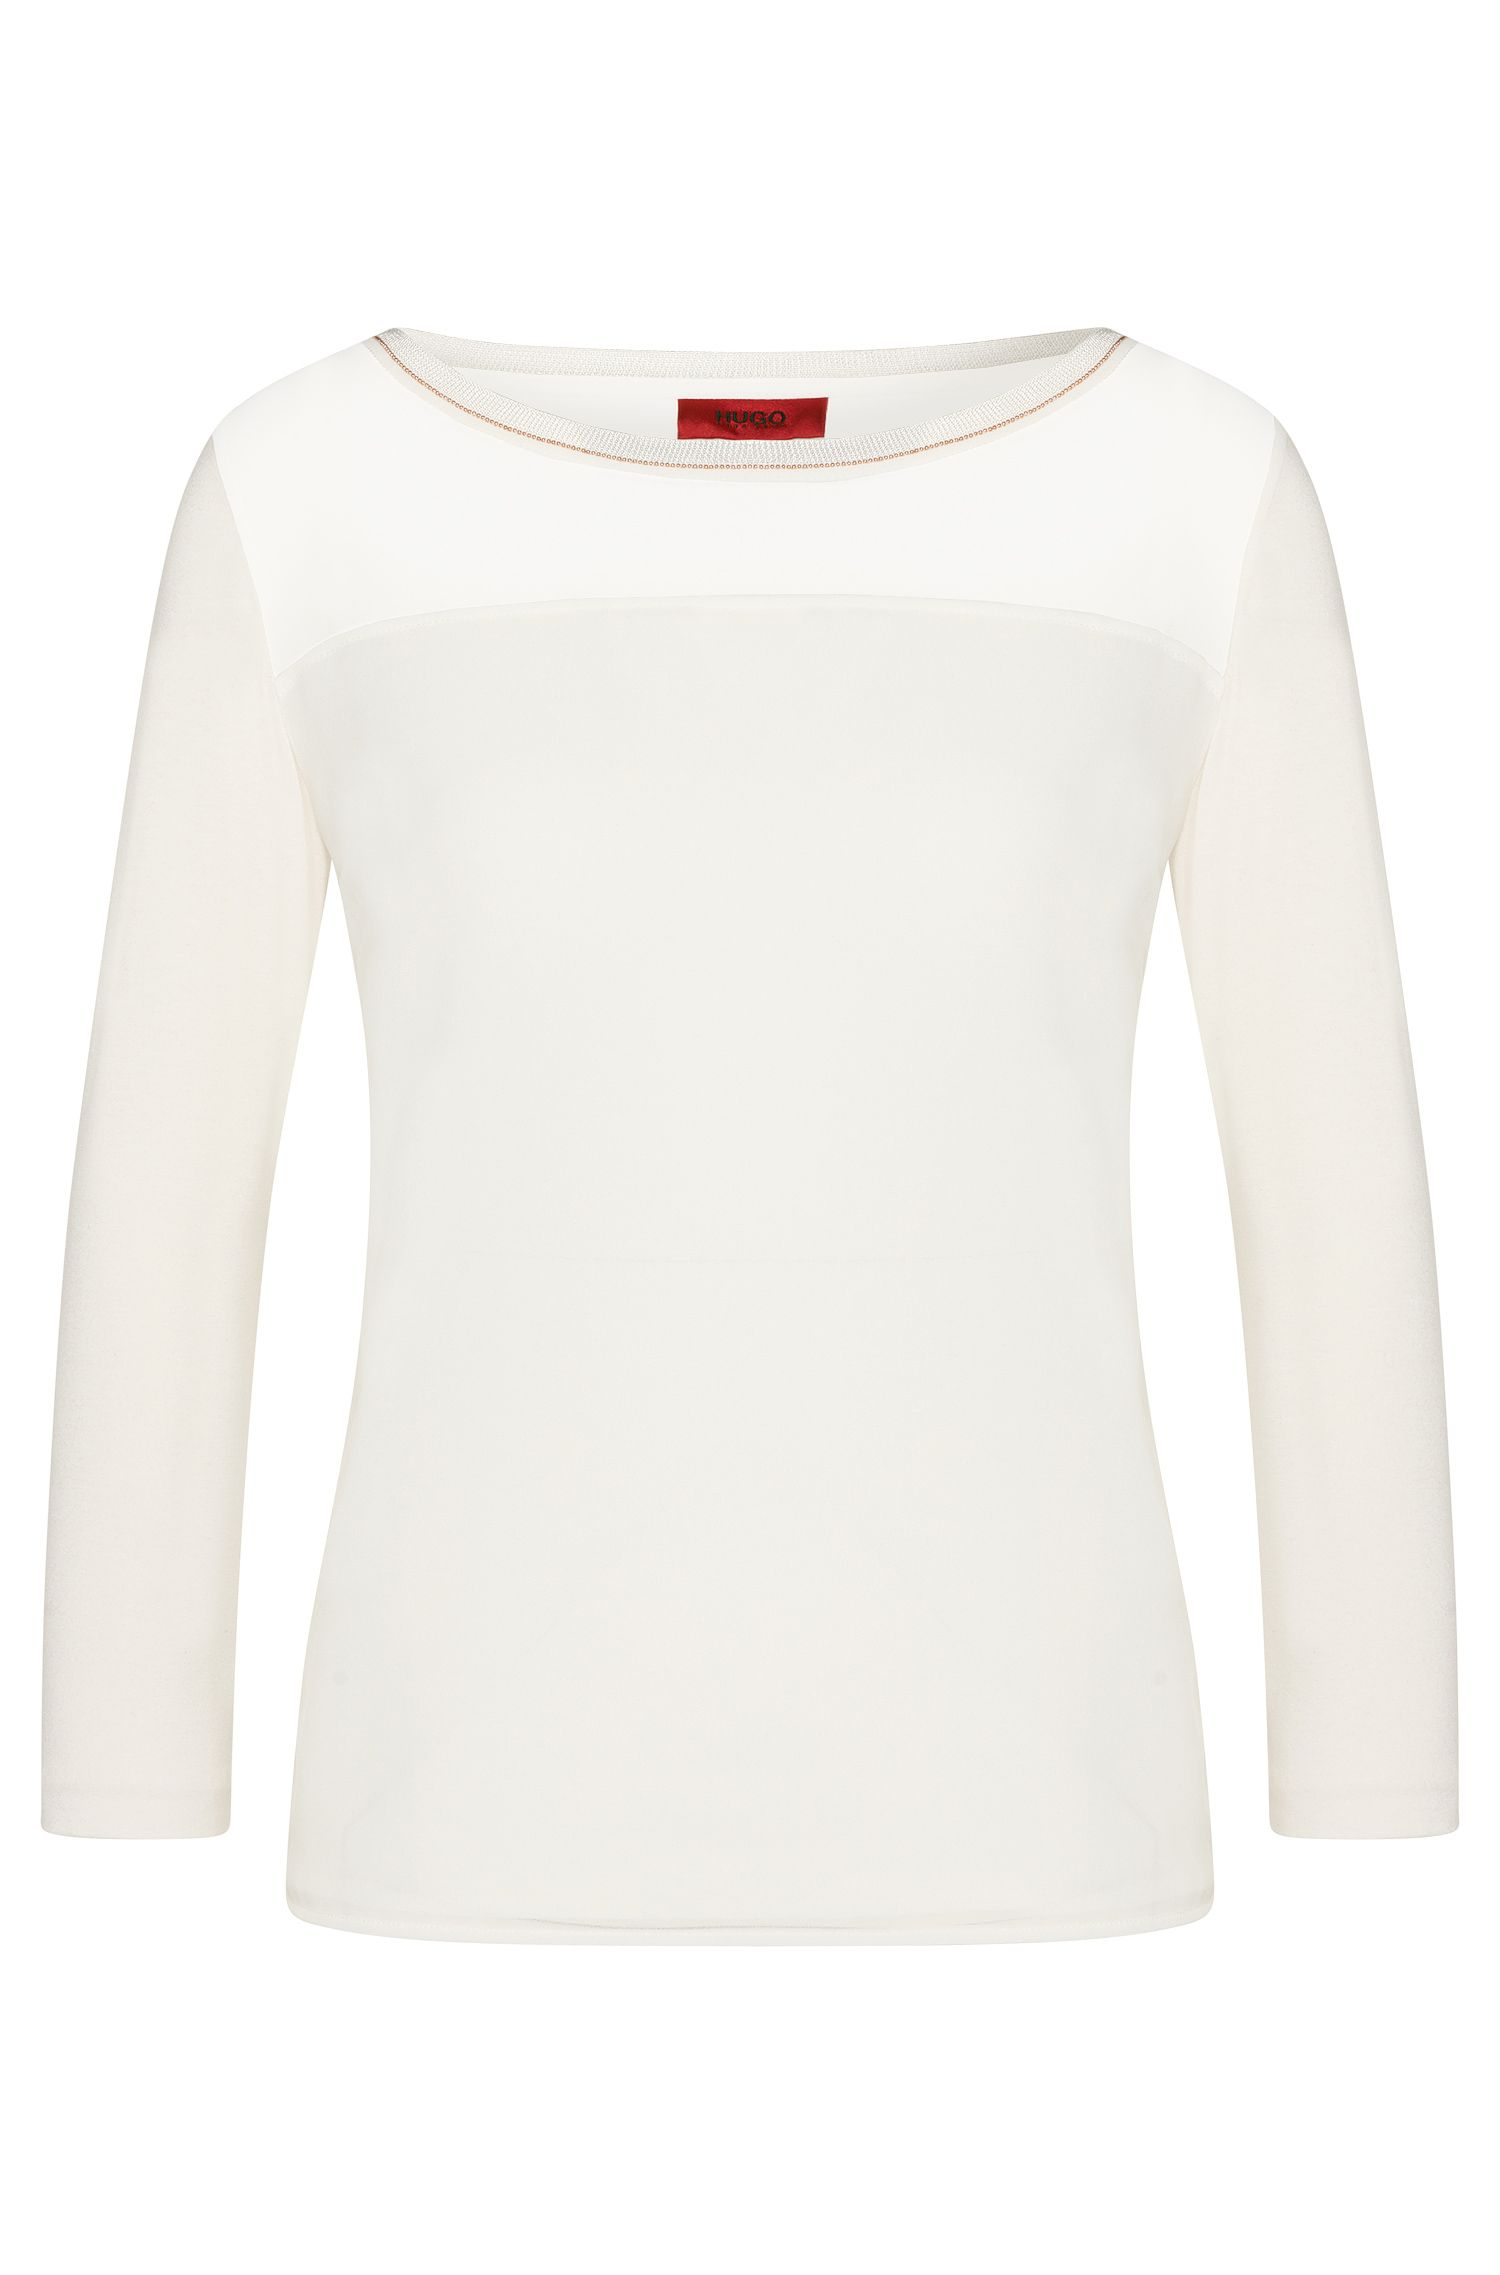 T-shirt en viscose extensible à empiècement fin orné de perles: «Difesta»